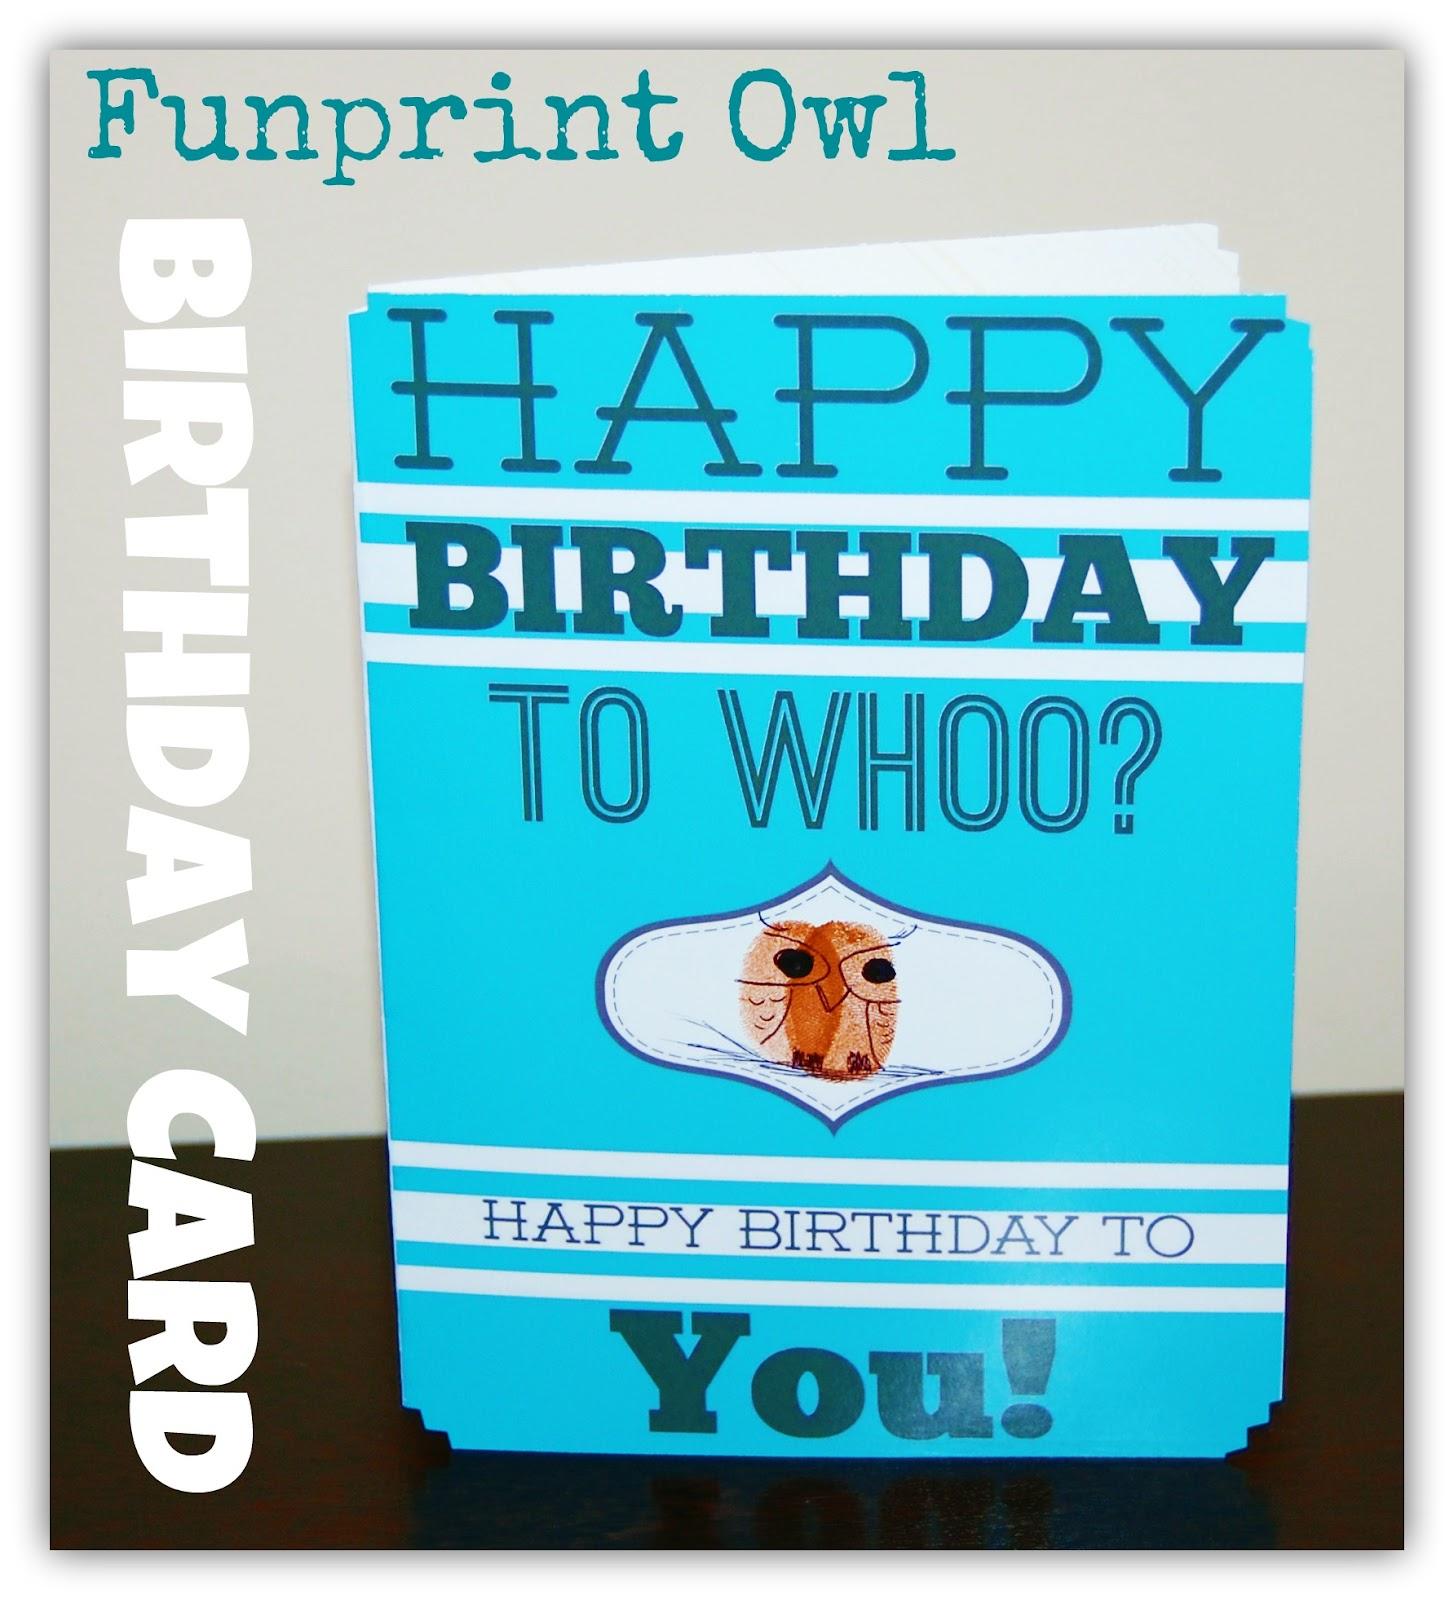 Happy Birthday Shoe Diva Happy birthday to whoo?